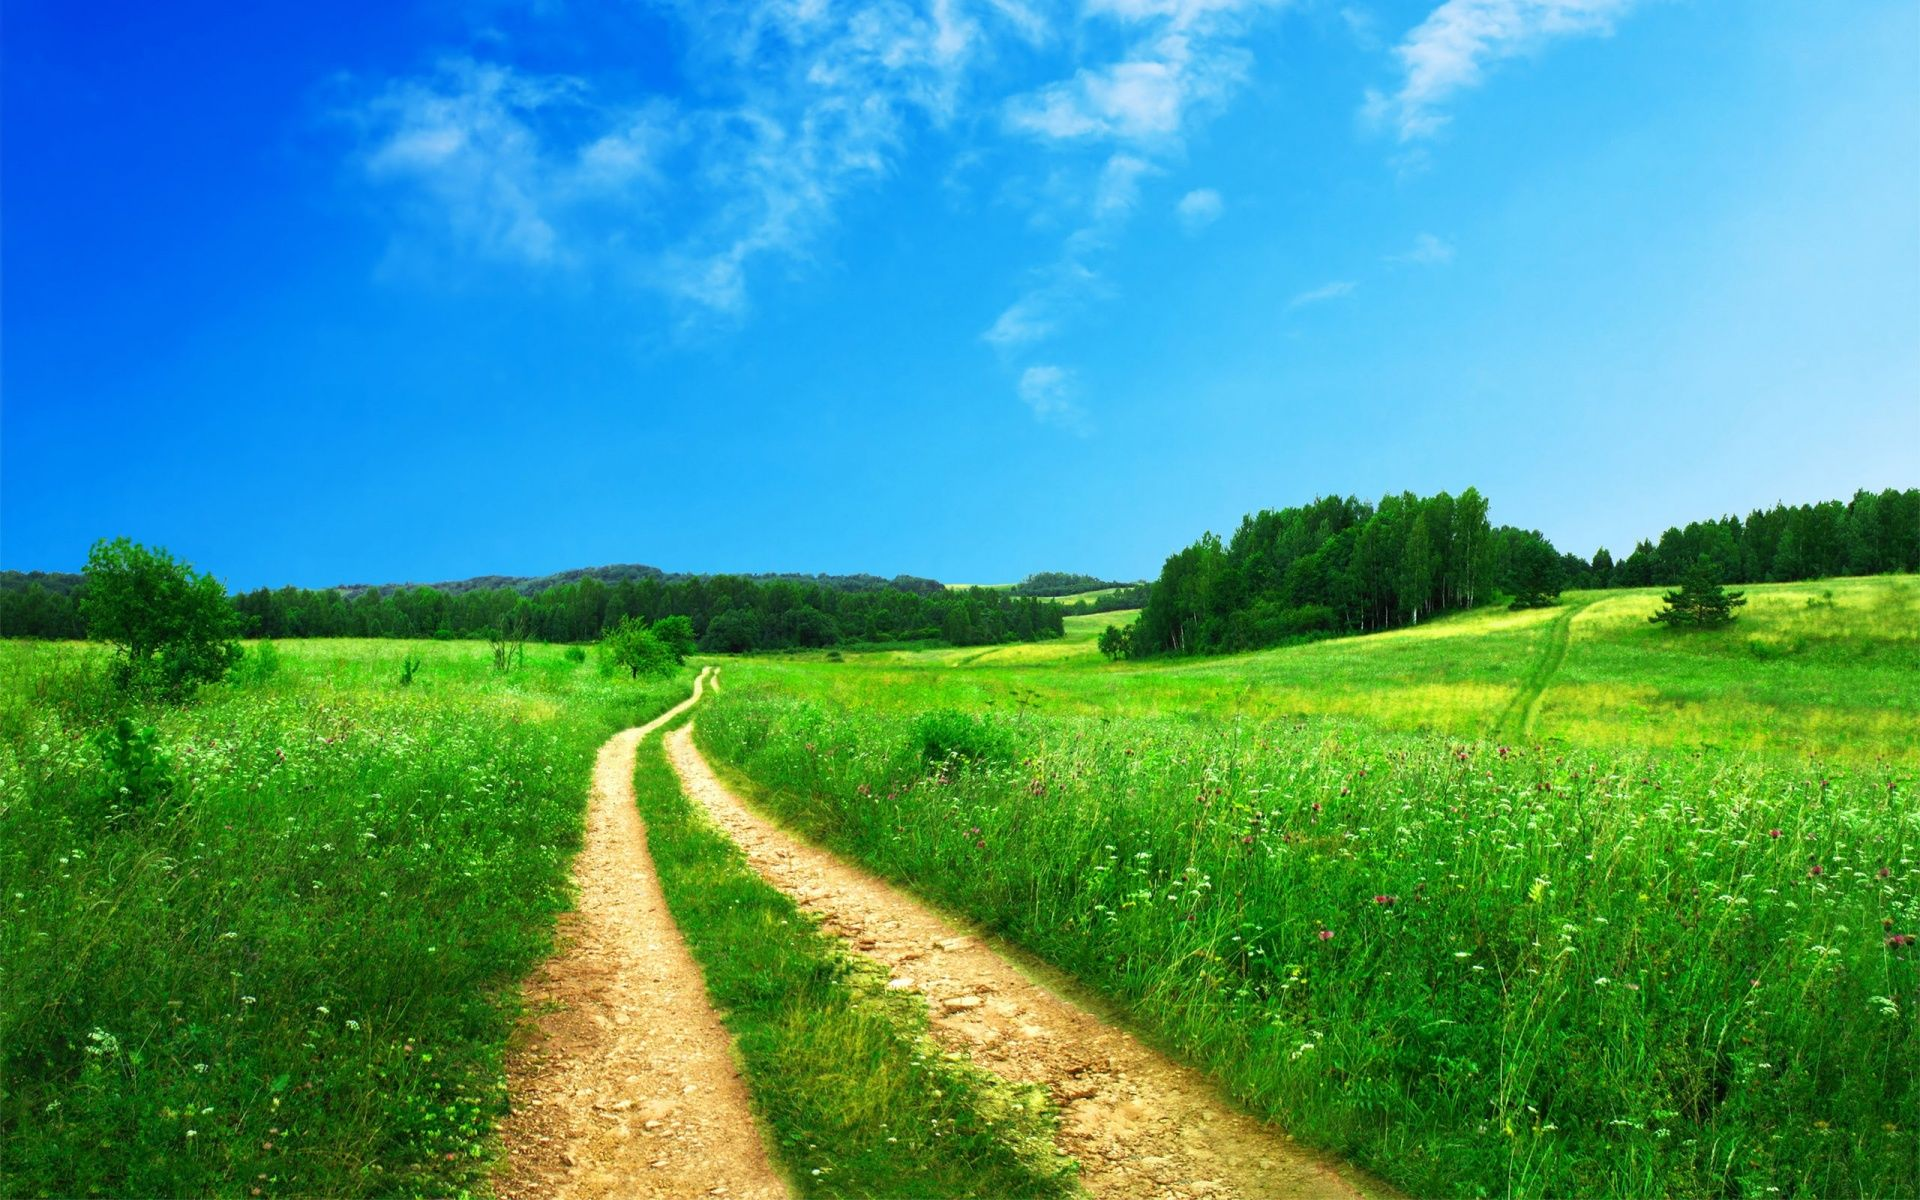 Countryside Path 2560x1440 Beautiful Scenery Wallpaper Landscape Wallpaper Scenery Wallpaper